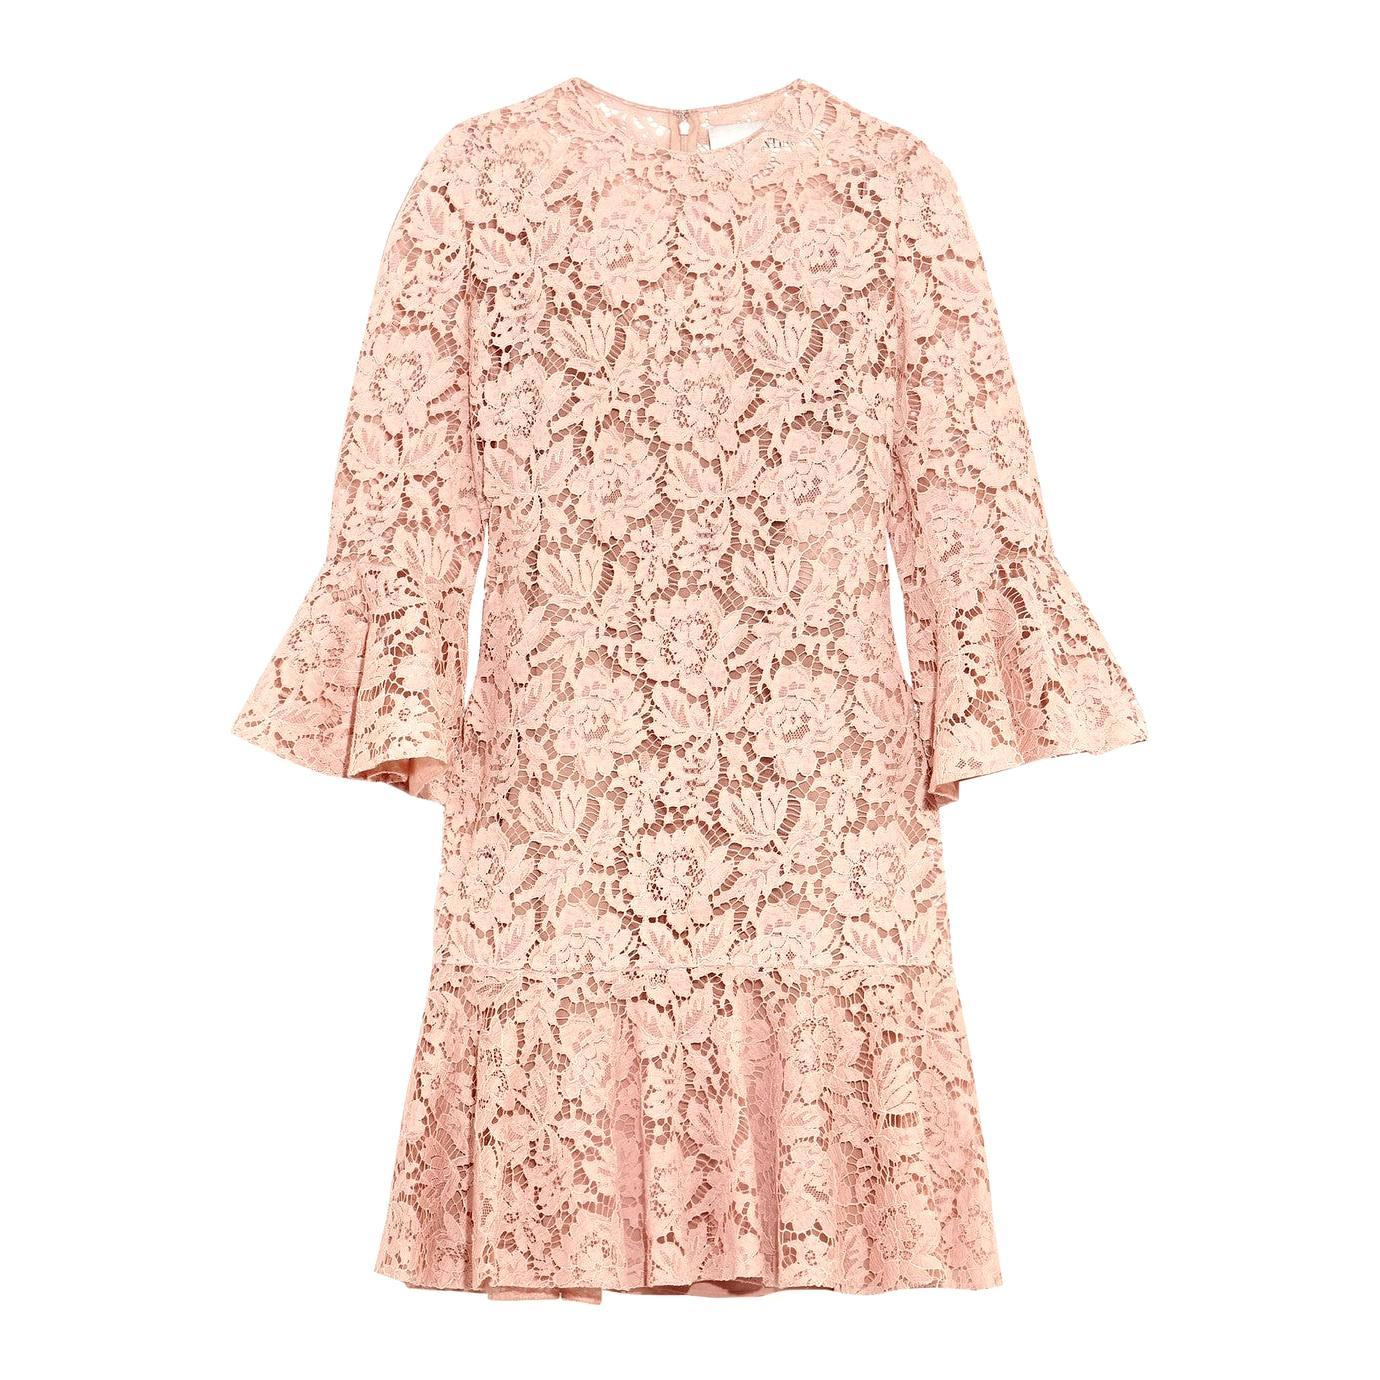 Valentino Ruffled Corded Cotton-Blend Guipure-Lace Mini Dress